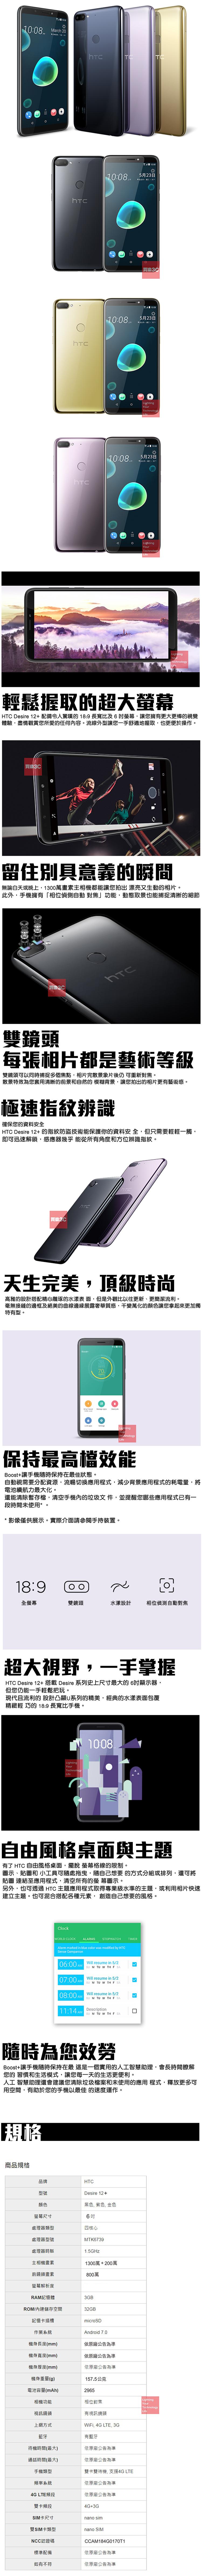 網頁HTC Desire 12+